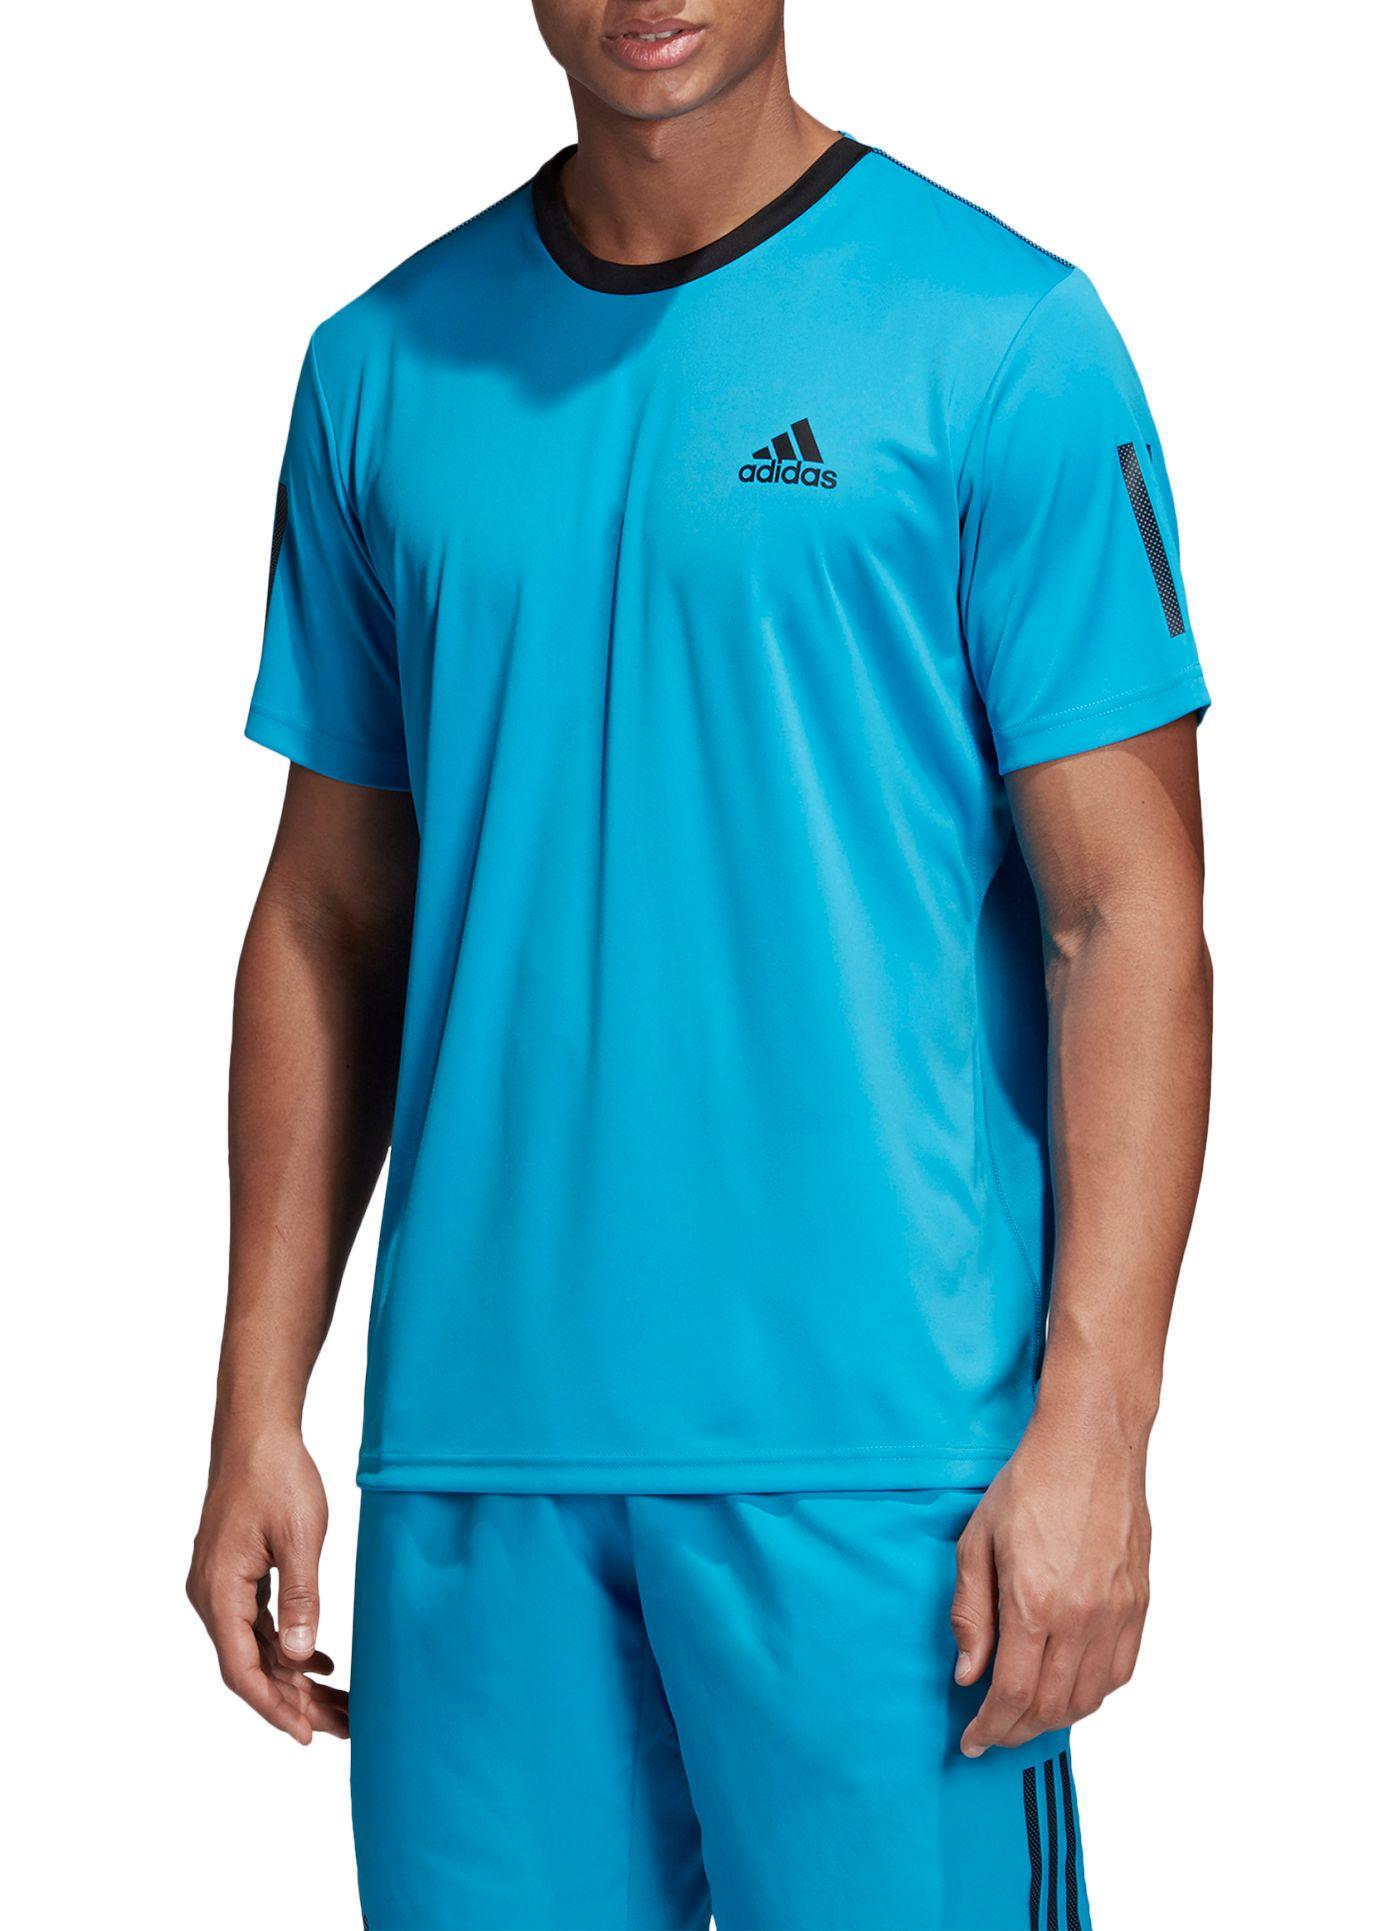 adidas Men's Club 3-Stripe Tennis T-Shirt